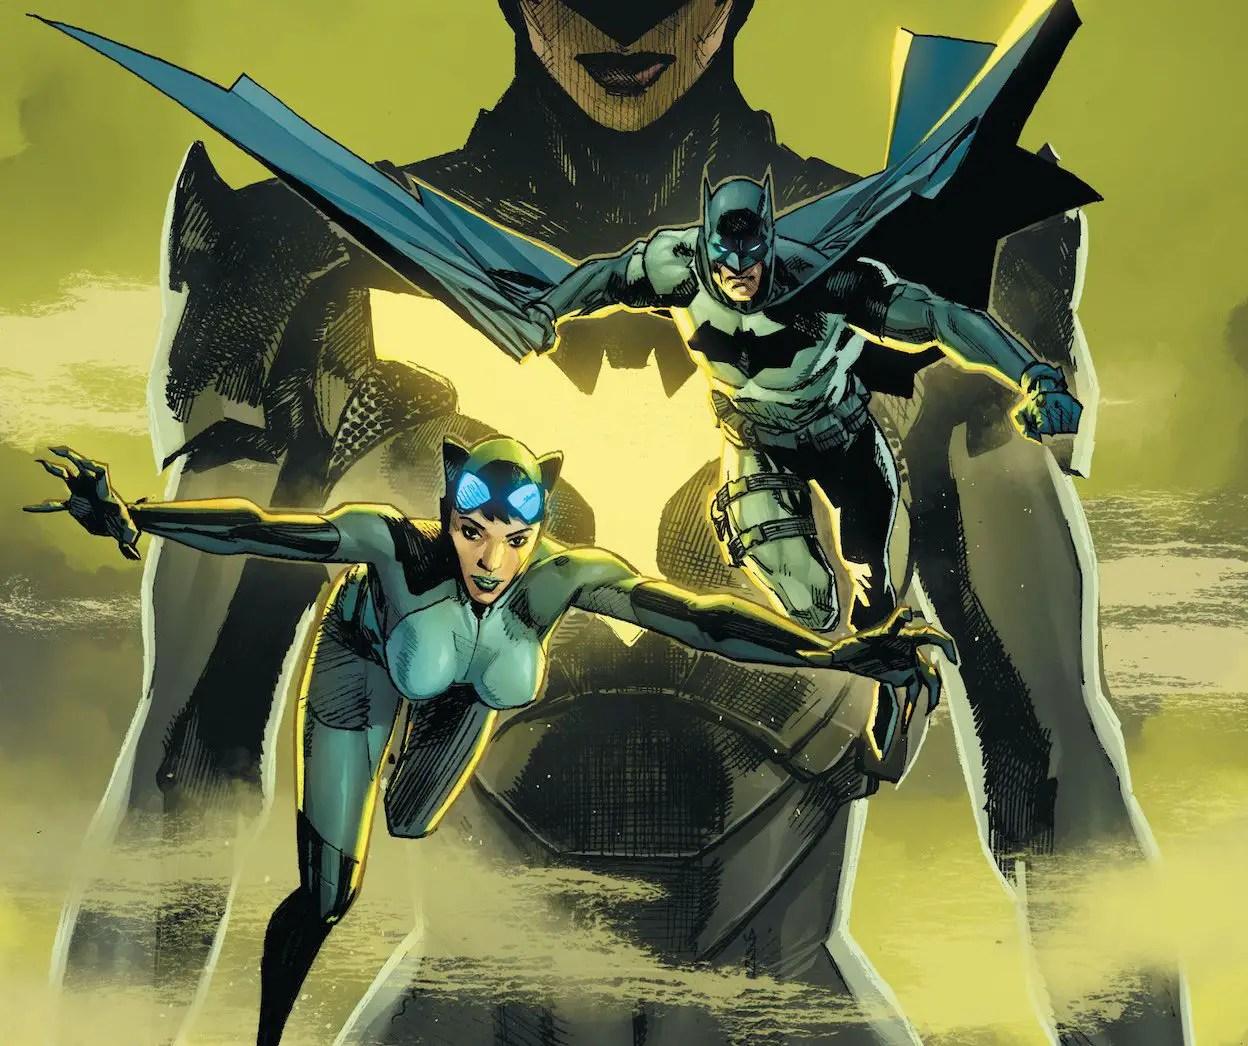 'Batman/Catwoman' #4 pushes Phantasm to center stage